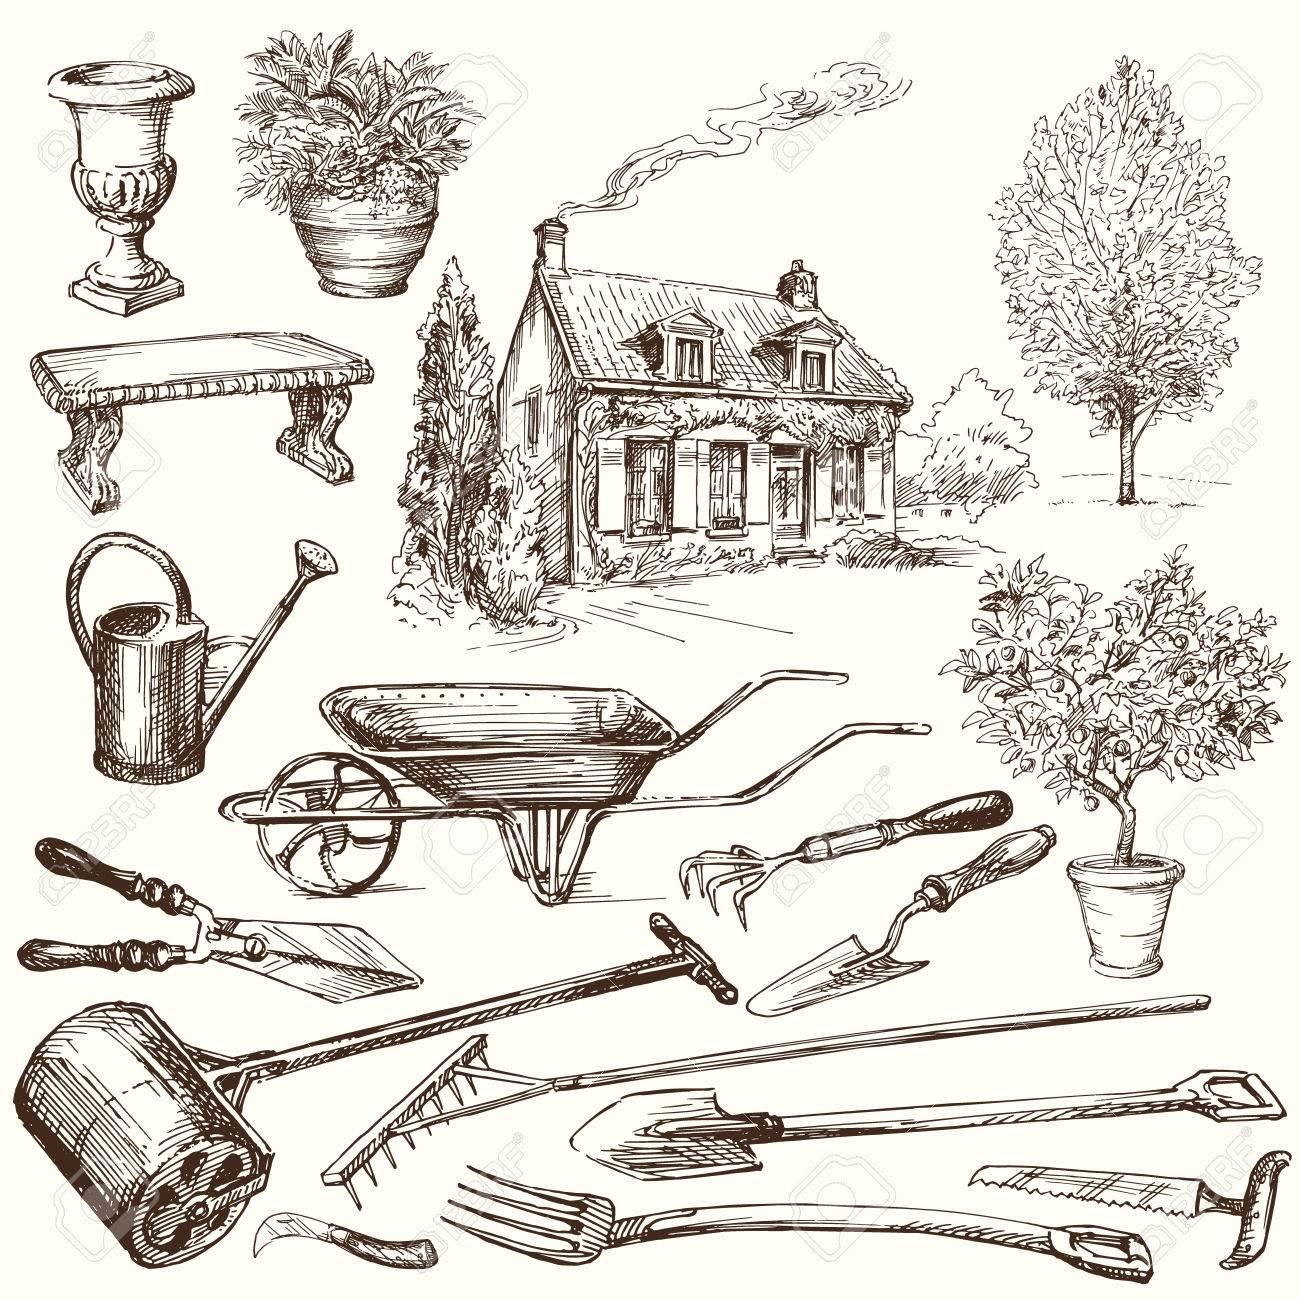 gardening, garden tools - hand drawn collection Stock Vector - 36853309